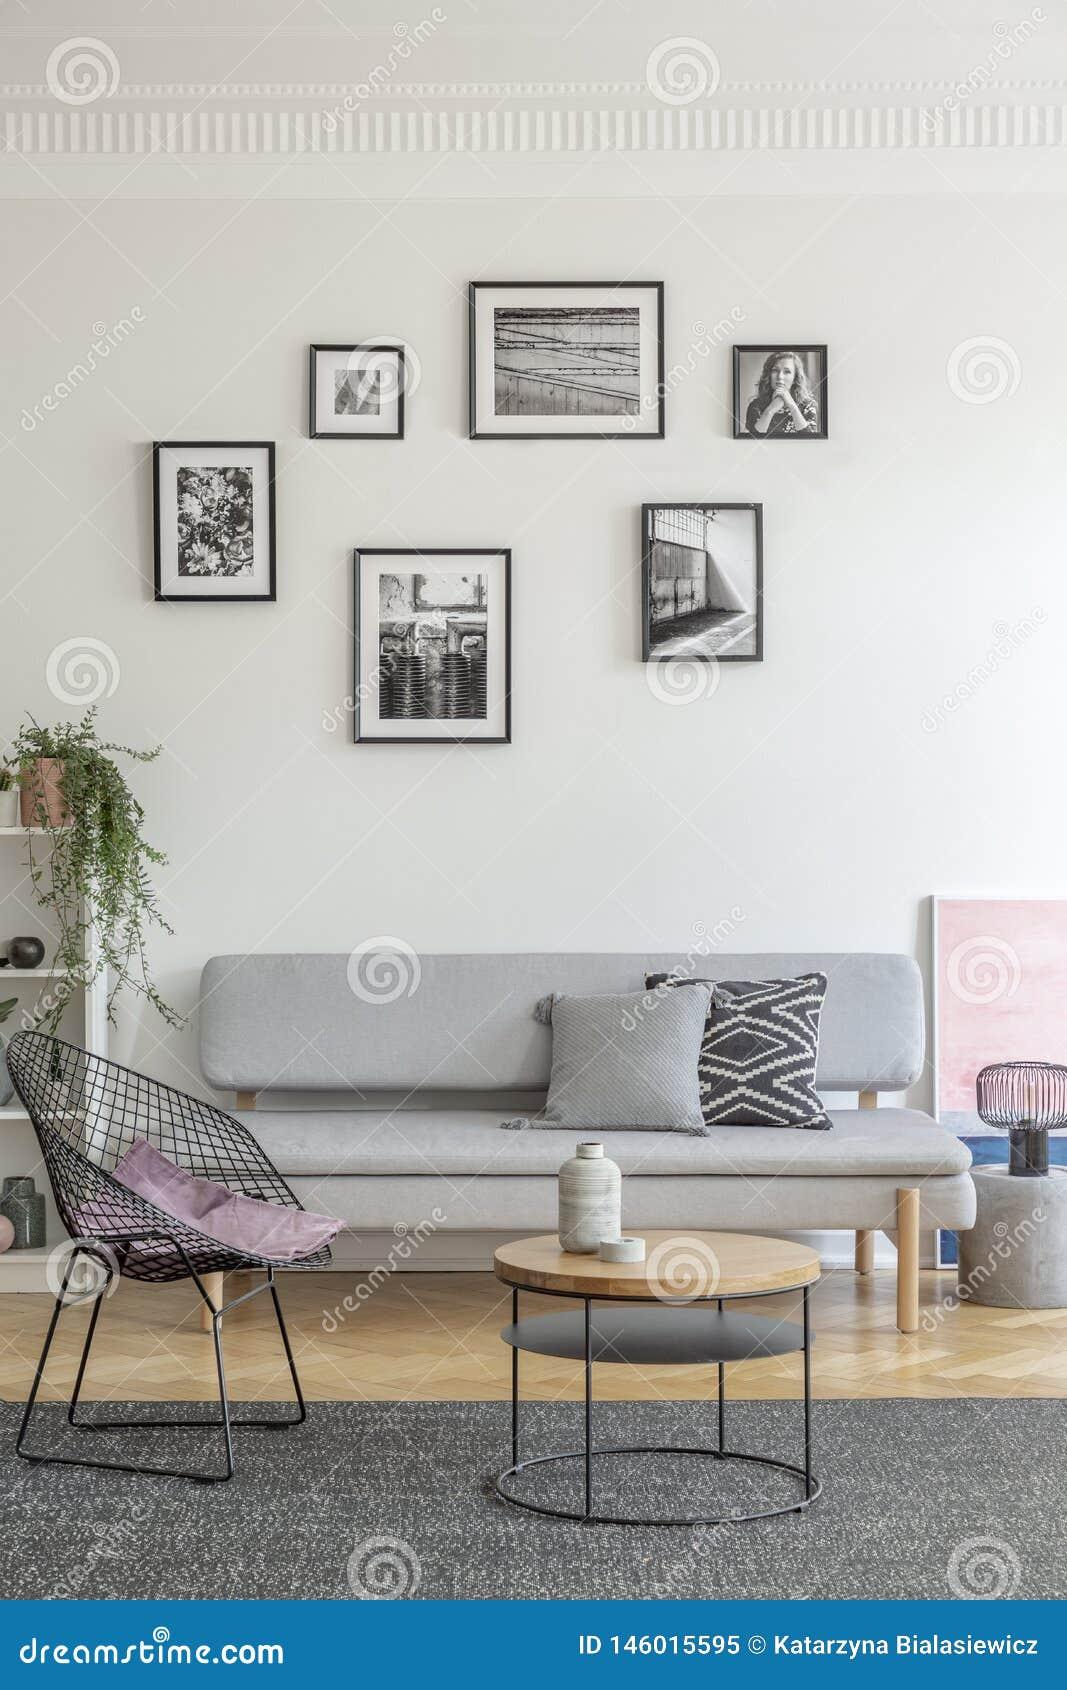 20,20 Scandinavian Chair Design Photos   Free & Royalty Free Stock ...